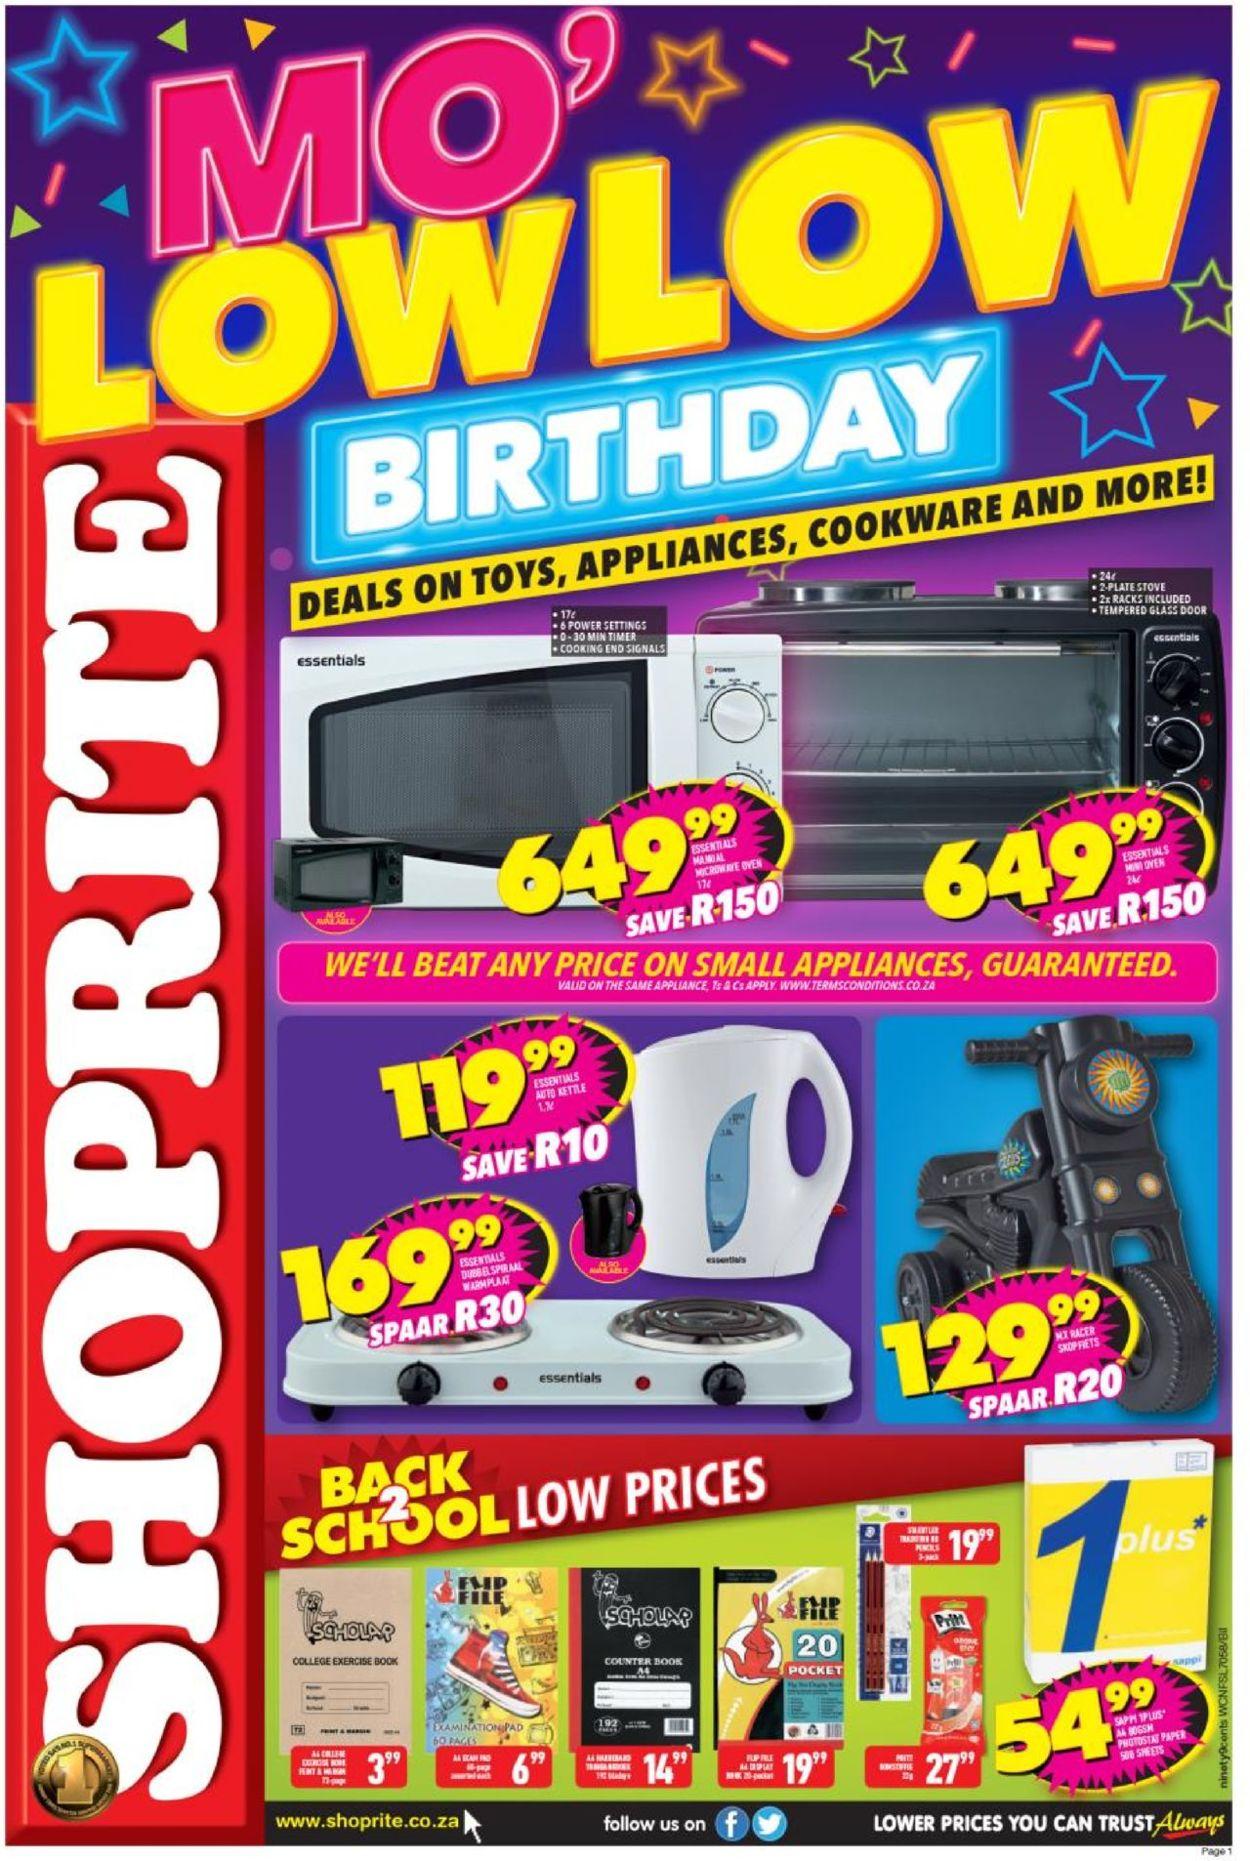 Shoprite Catalogue - 2019/07/22-2019/08/04